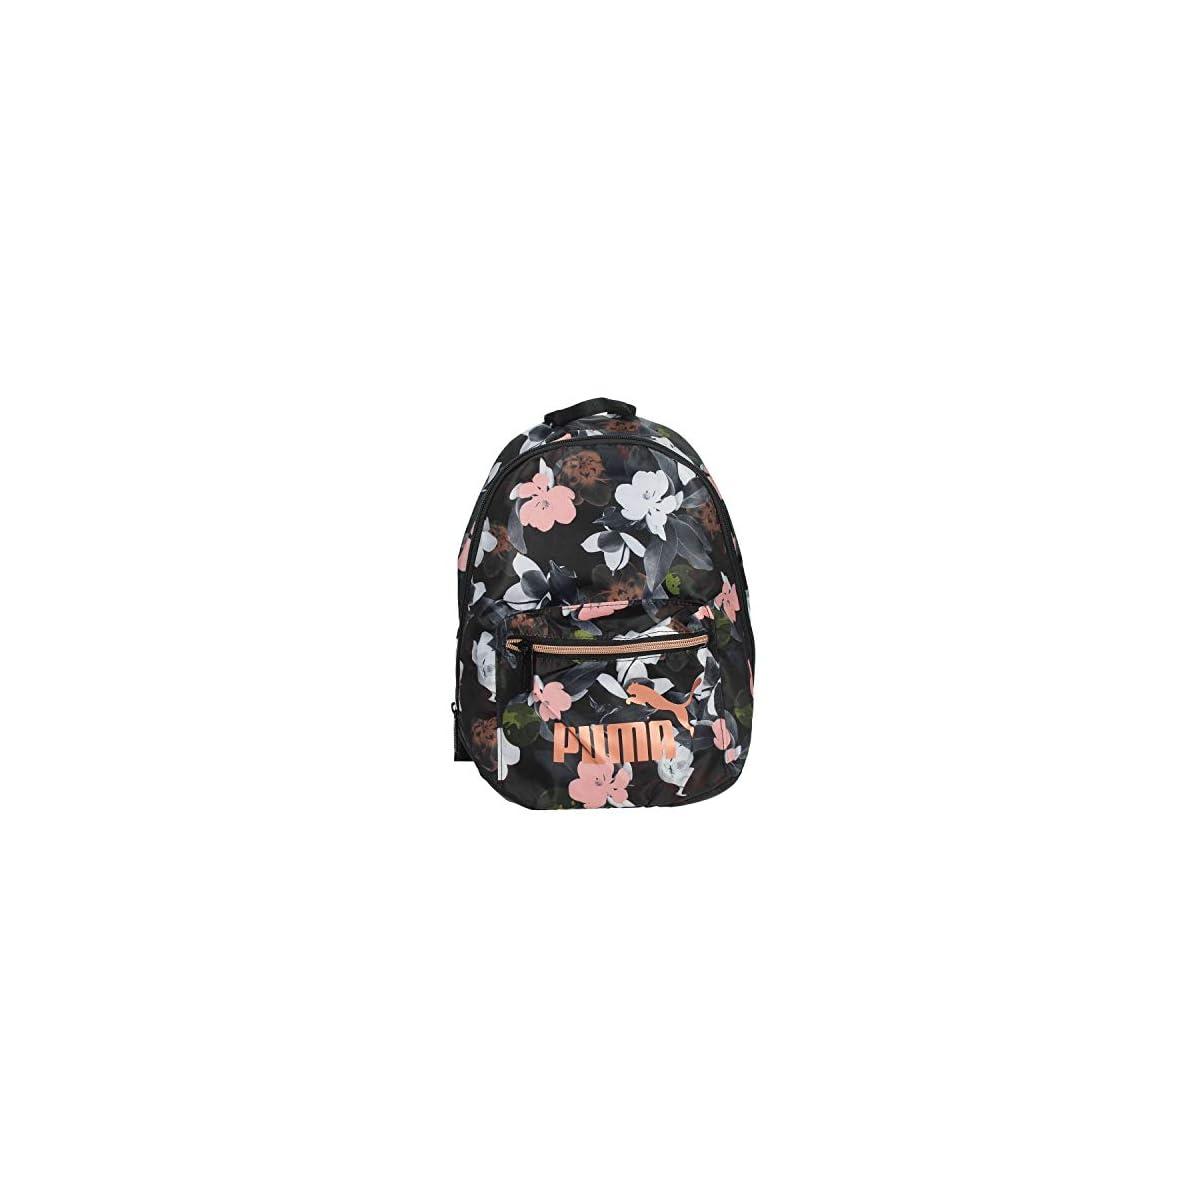 51vEtKWc00L. SS1200  - Puma Wmn Core Seasonal Archive Backpack Mochilla, Mujer